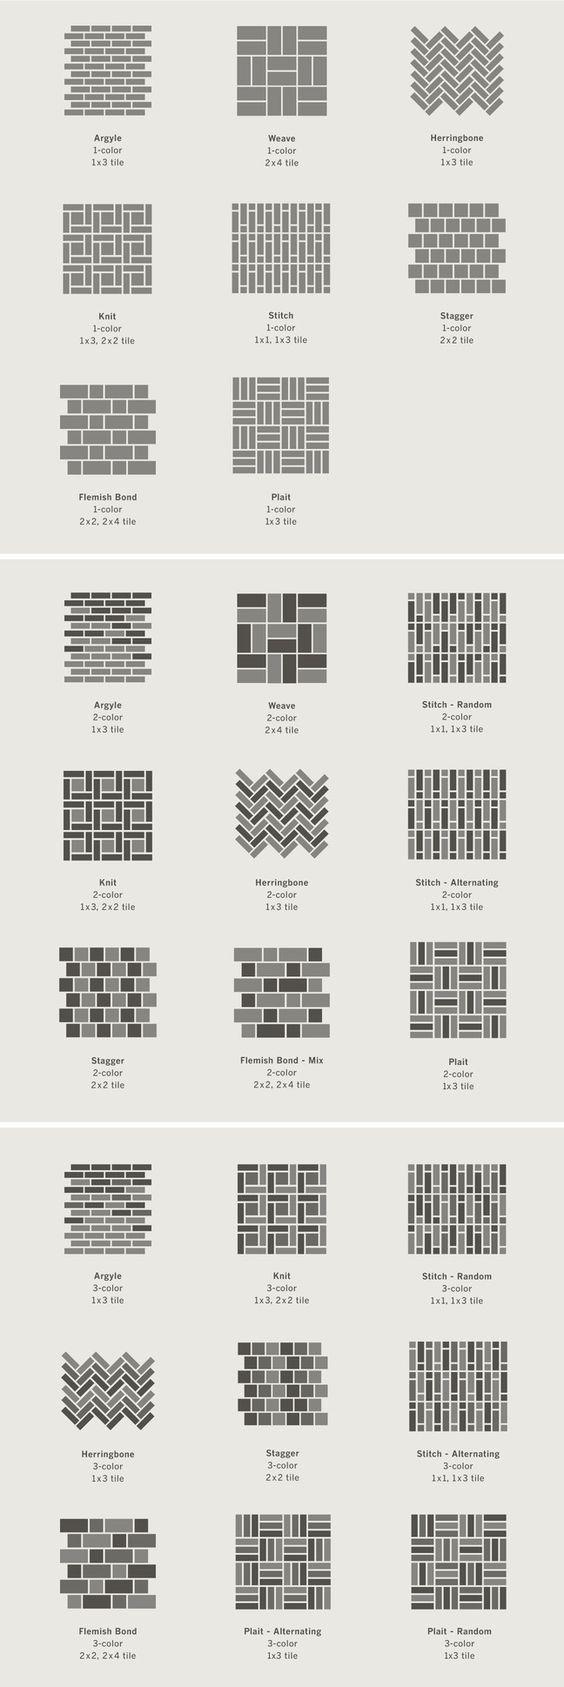 Tapestry - Heath Ceramics